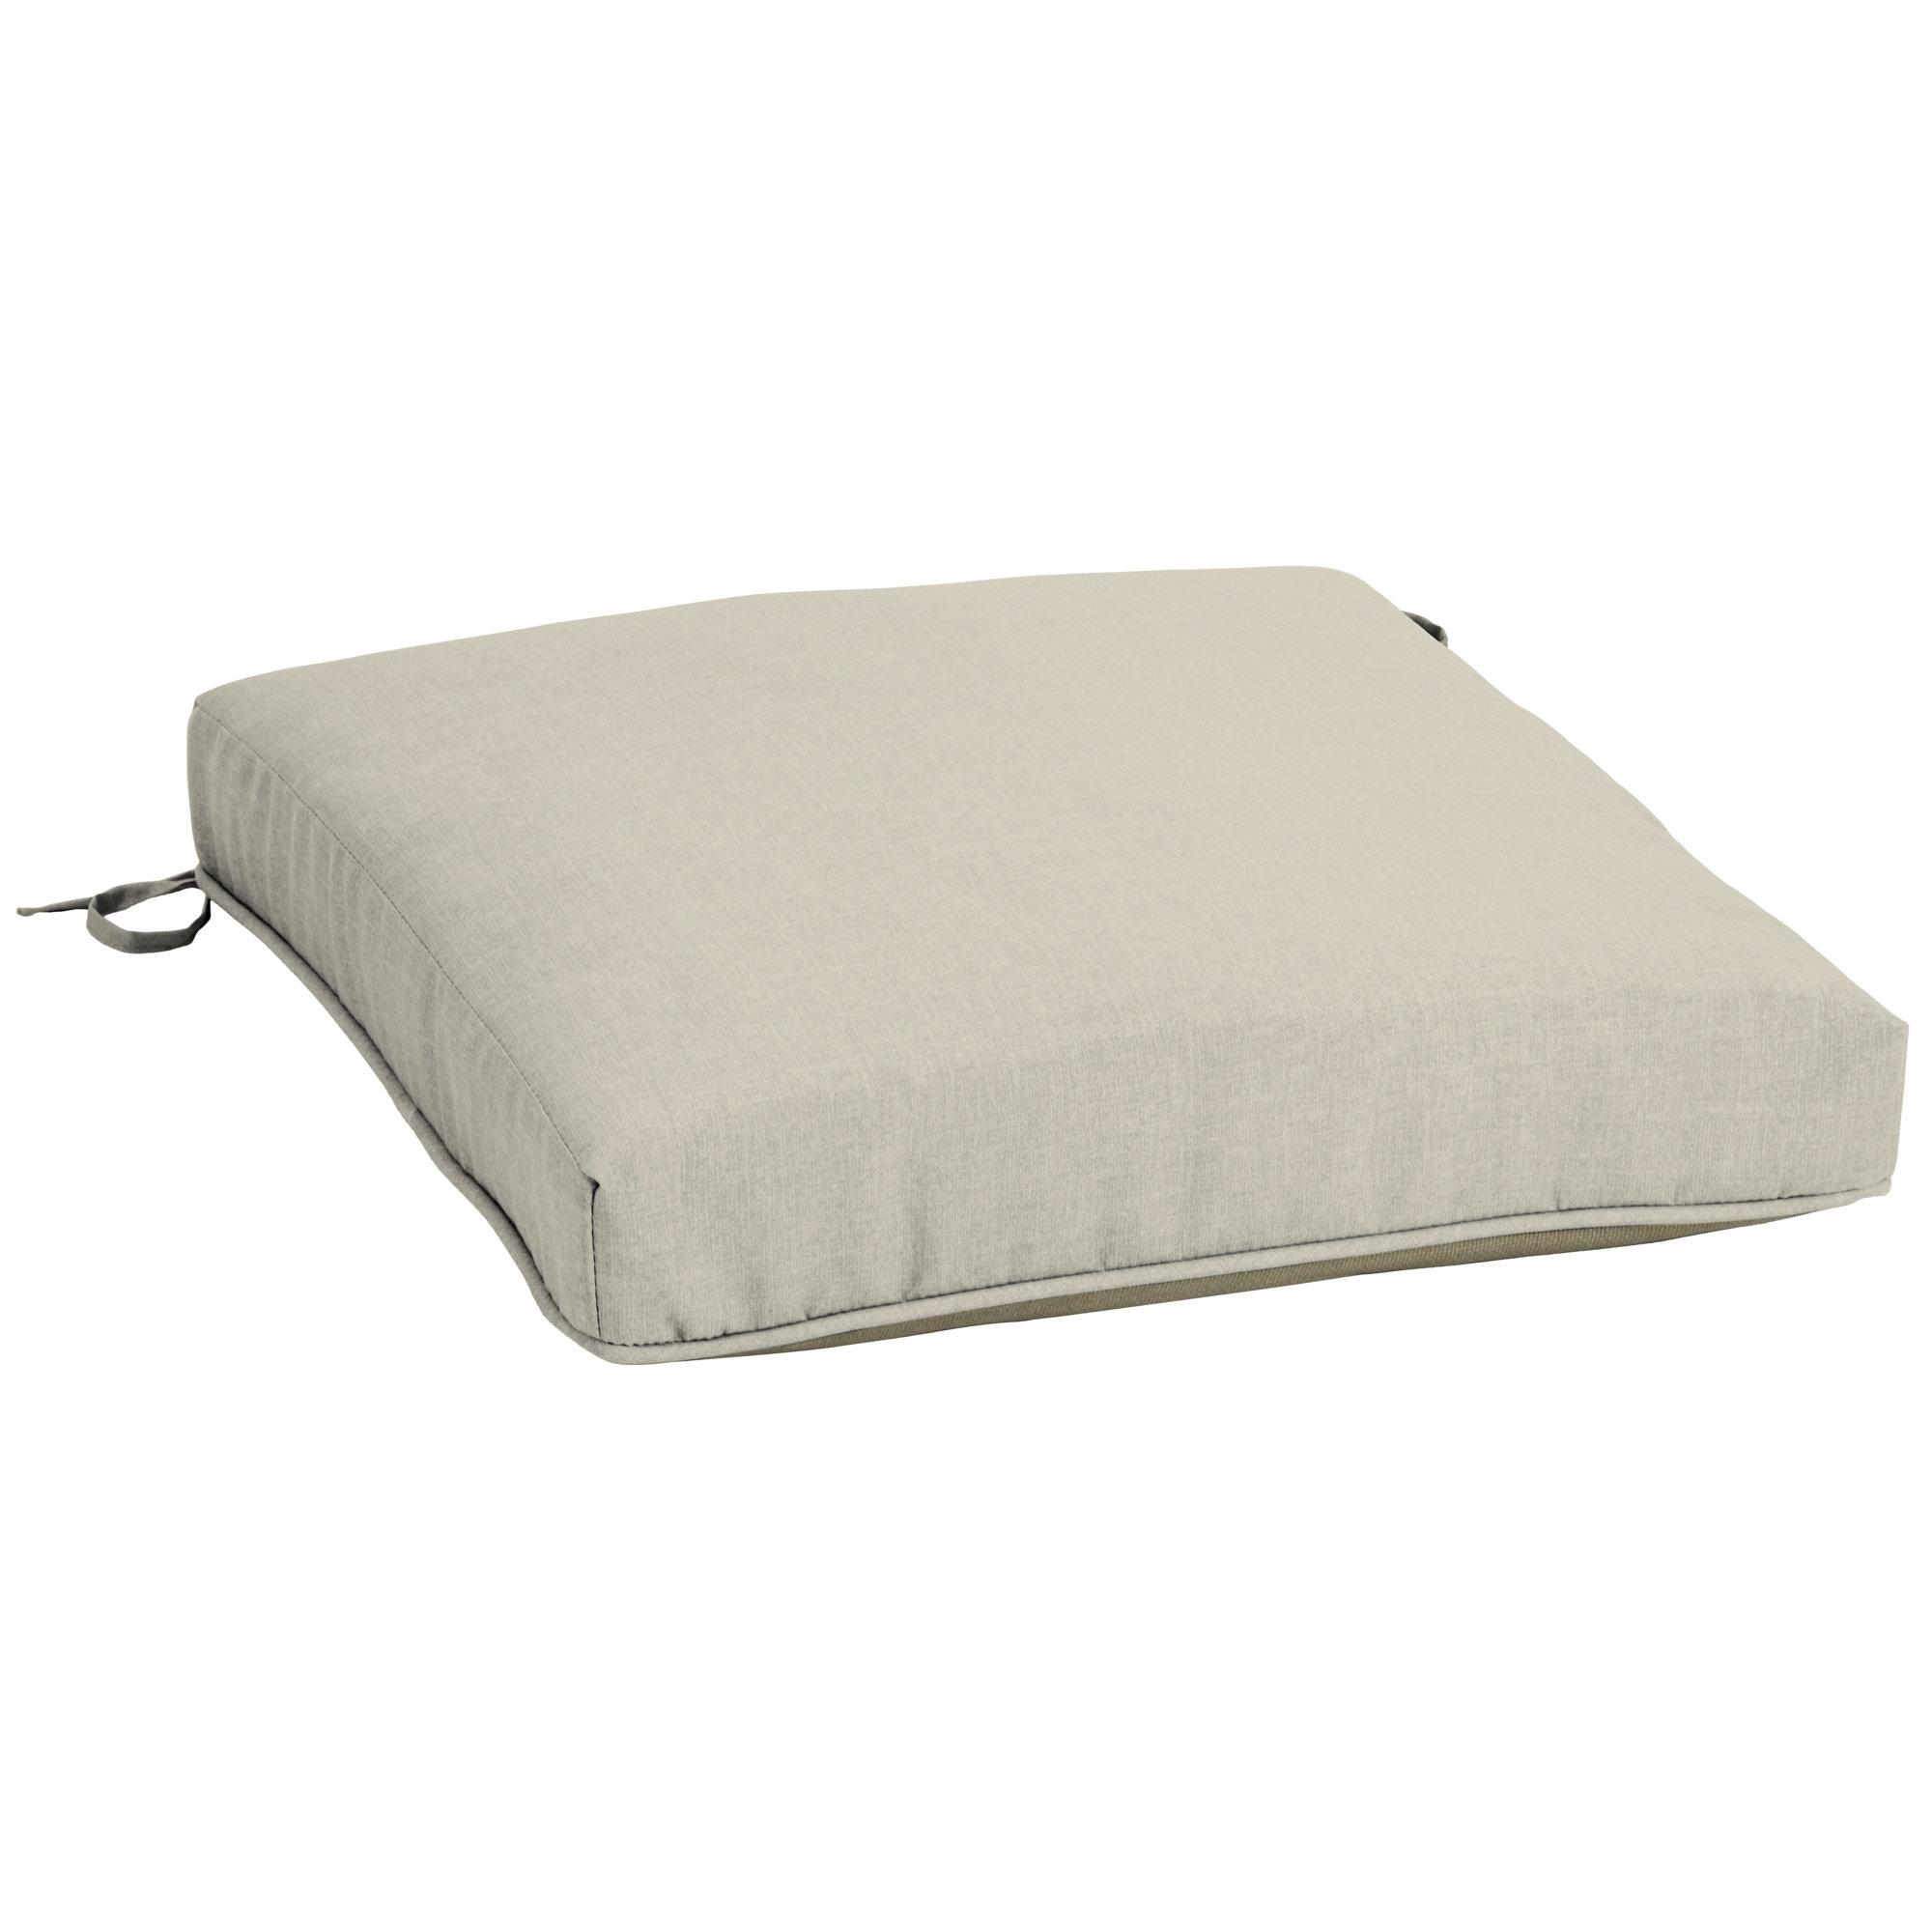 Sol 72 Outdoor Adelia Texture Outdoor Dining Chair Cushion Reviews Wayfair